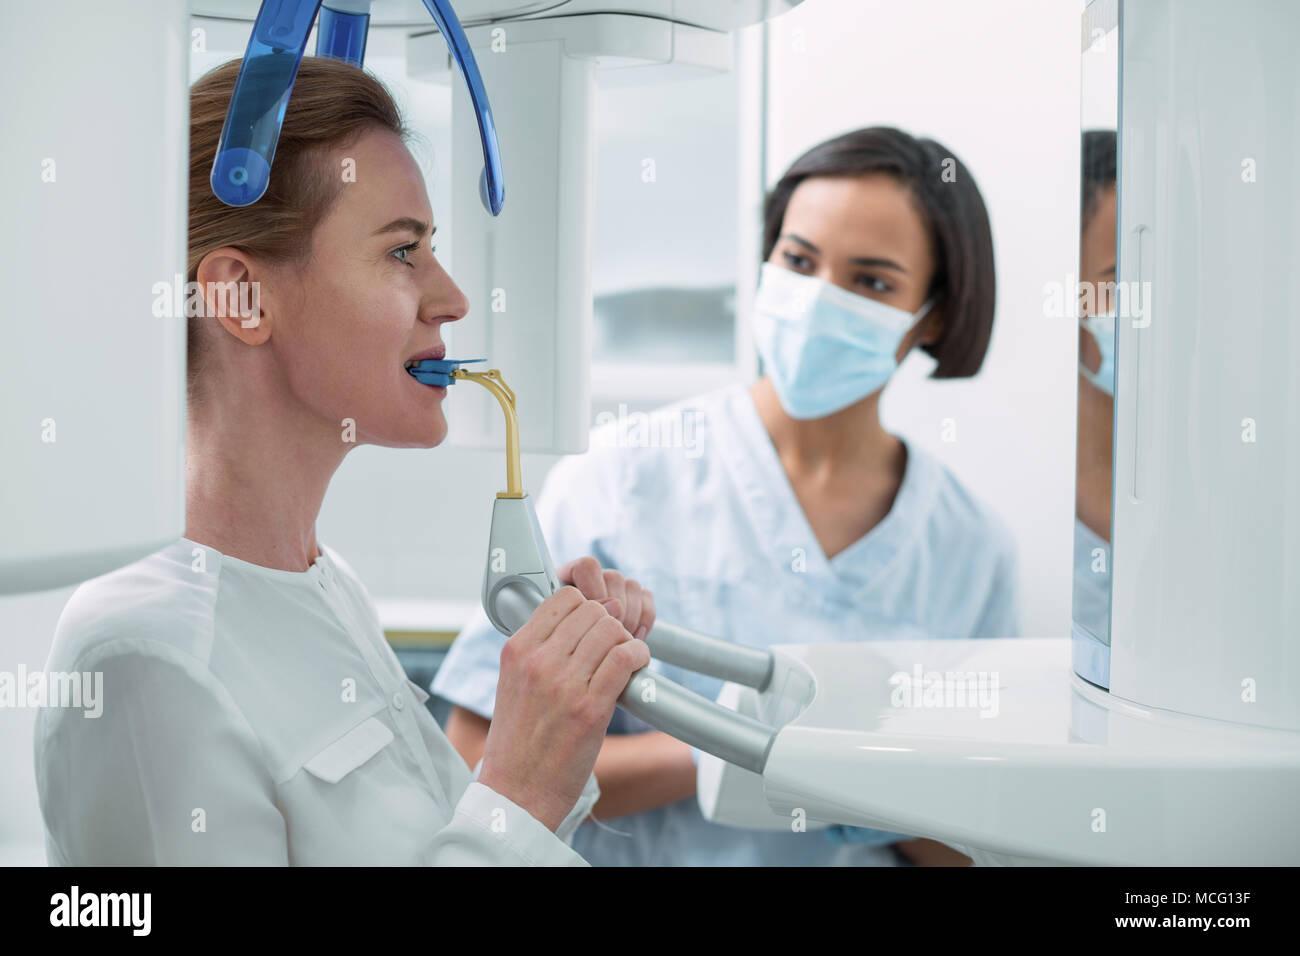 Wundervolle Zahnarzt ihre Patienten beobachten Stockbild